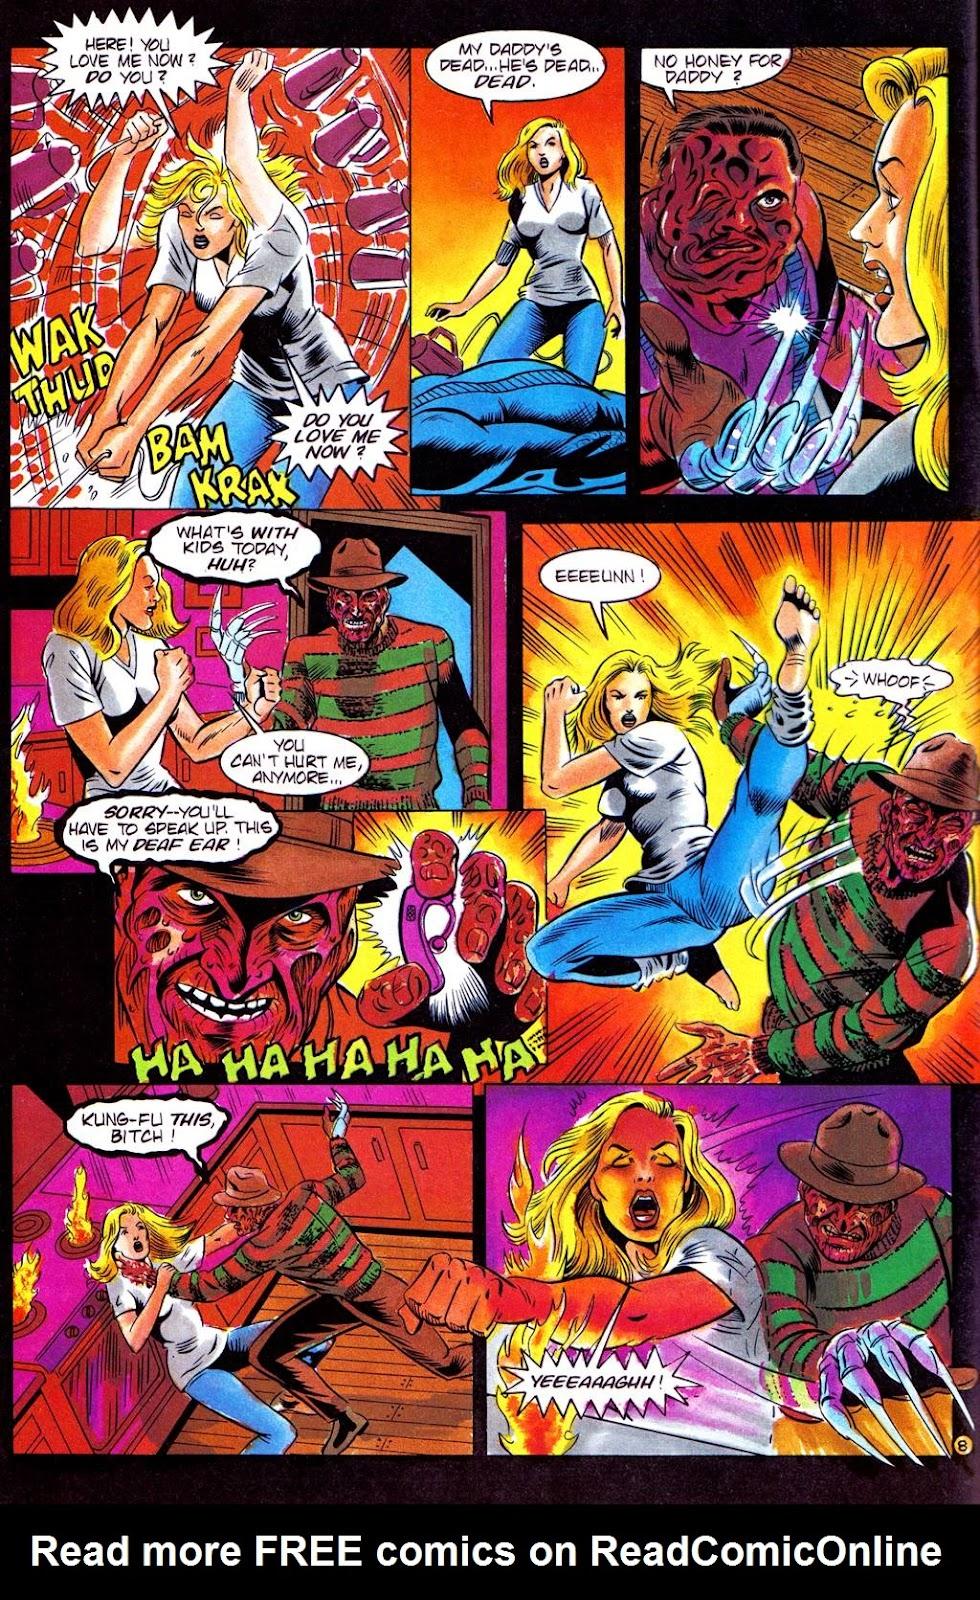 Read online Freddy's Dead: The Final Nightmare comic -  Issue #3 - 10